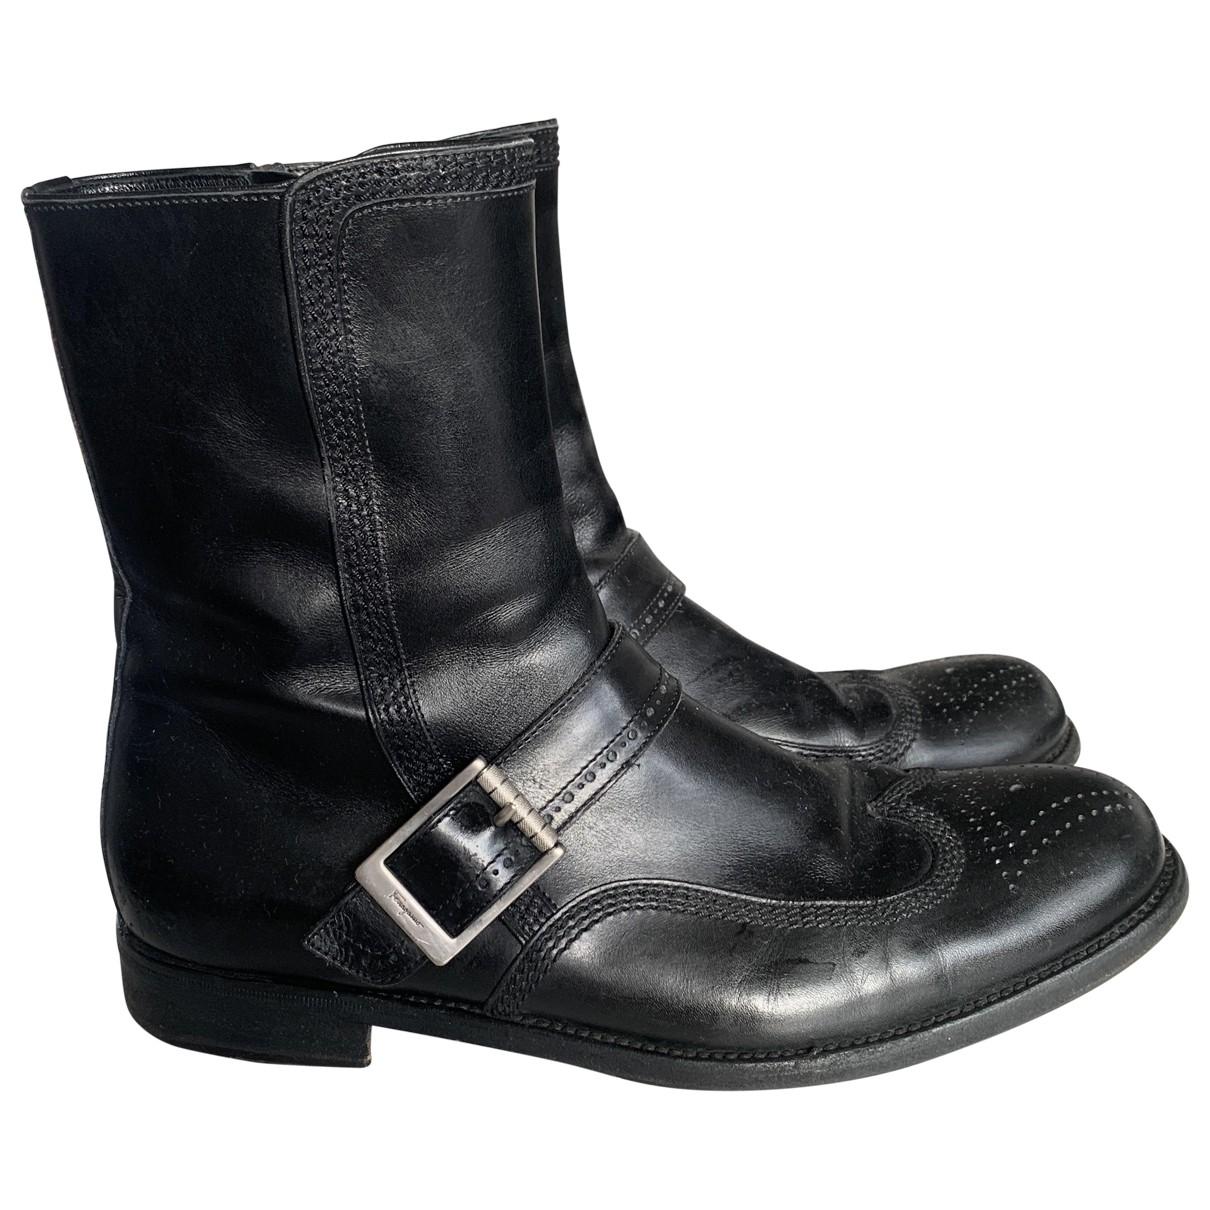 Salvatore Ferragamo \N Black Leather Boots for Men 7.5 US